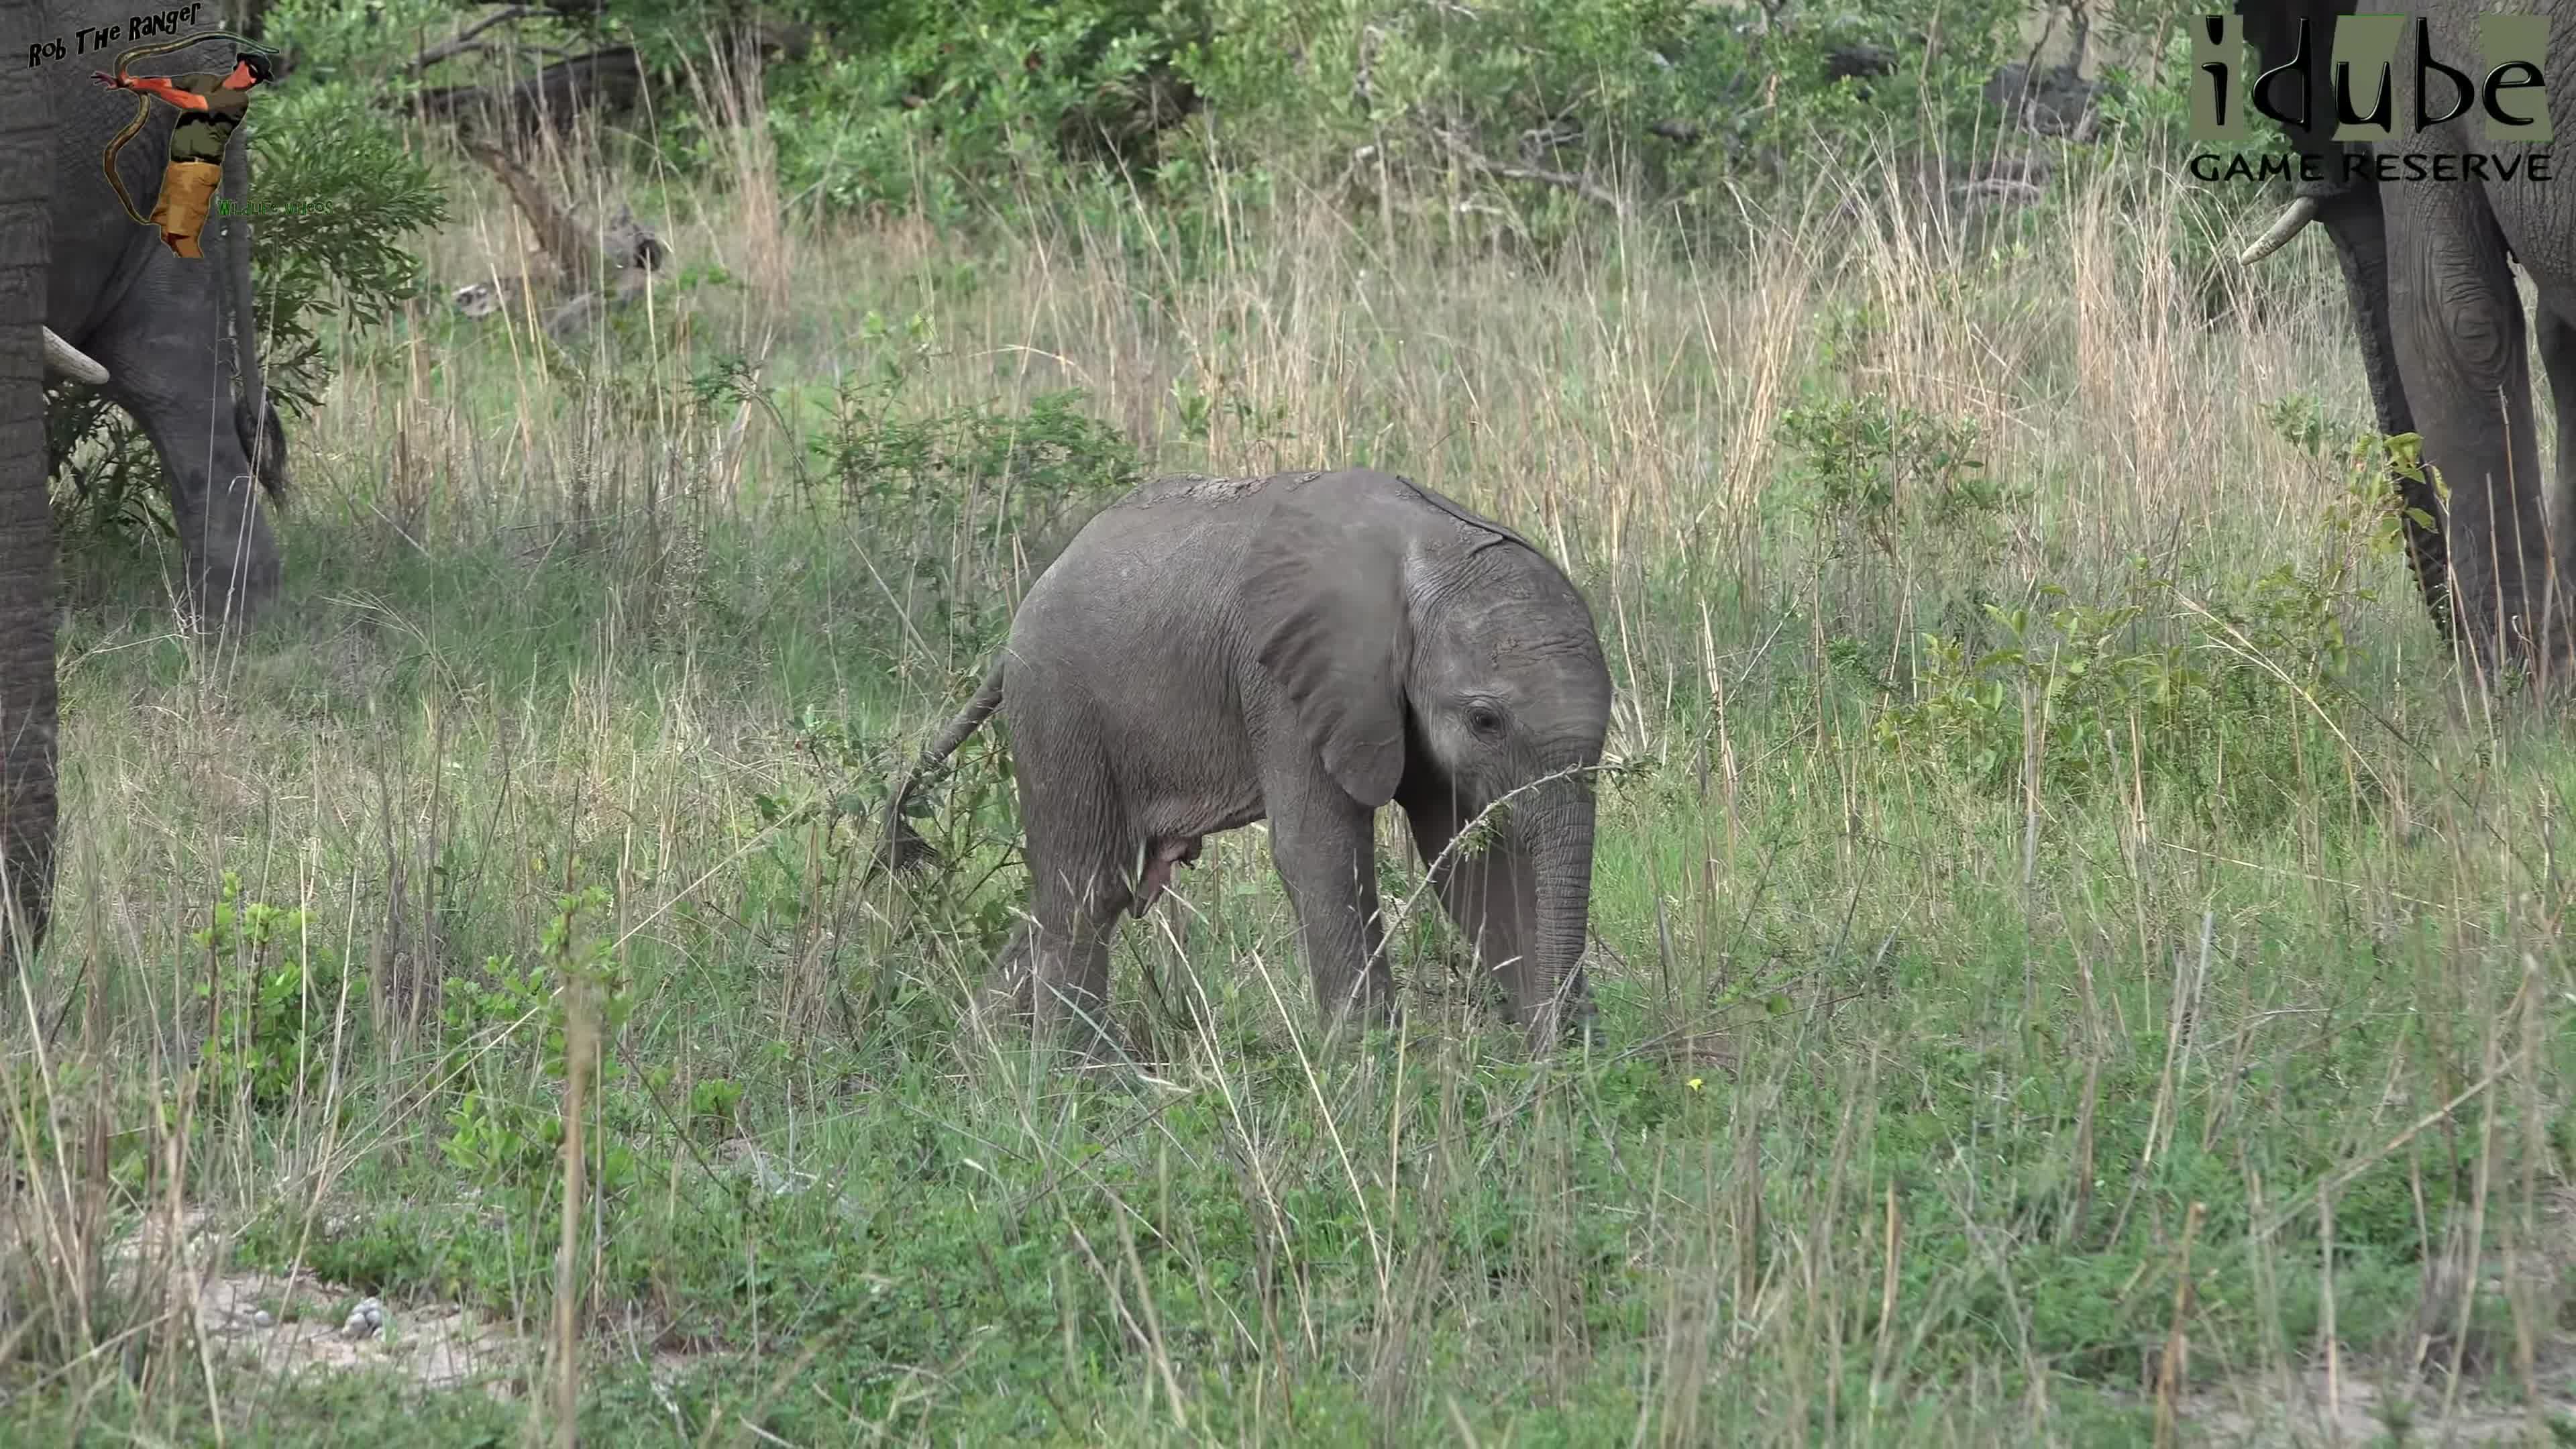 4K Video, African Elephant, Animals, Game Reserve, Kruger National Park, Nature, Wildlife, baby elephant, funny elephants, great wildlife clips, Elephant Herd Antics GIFs